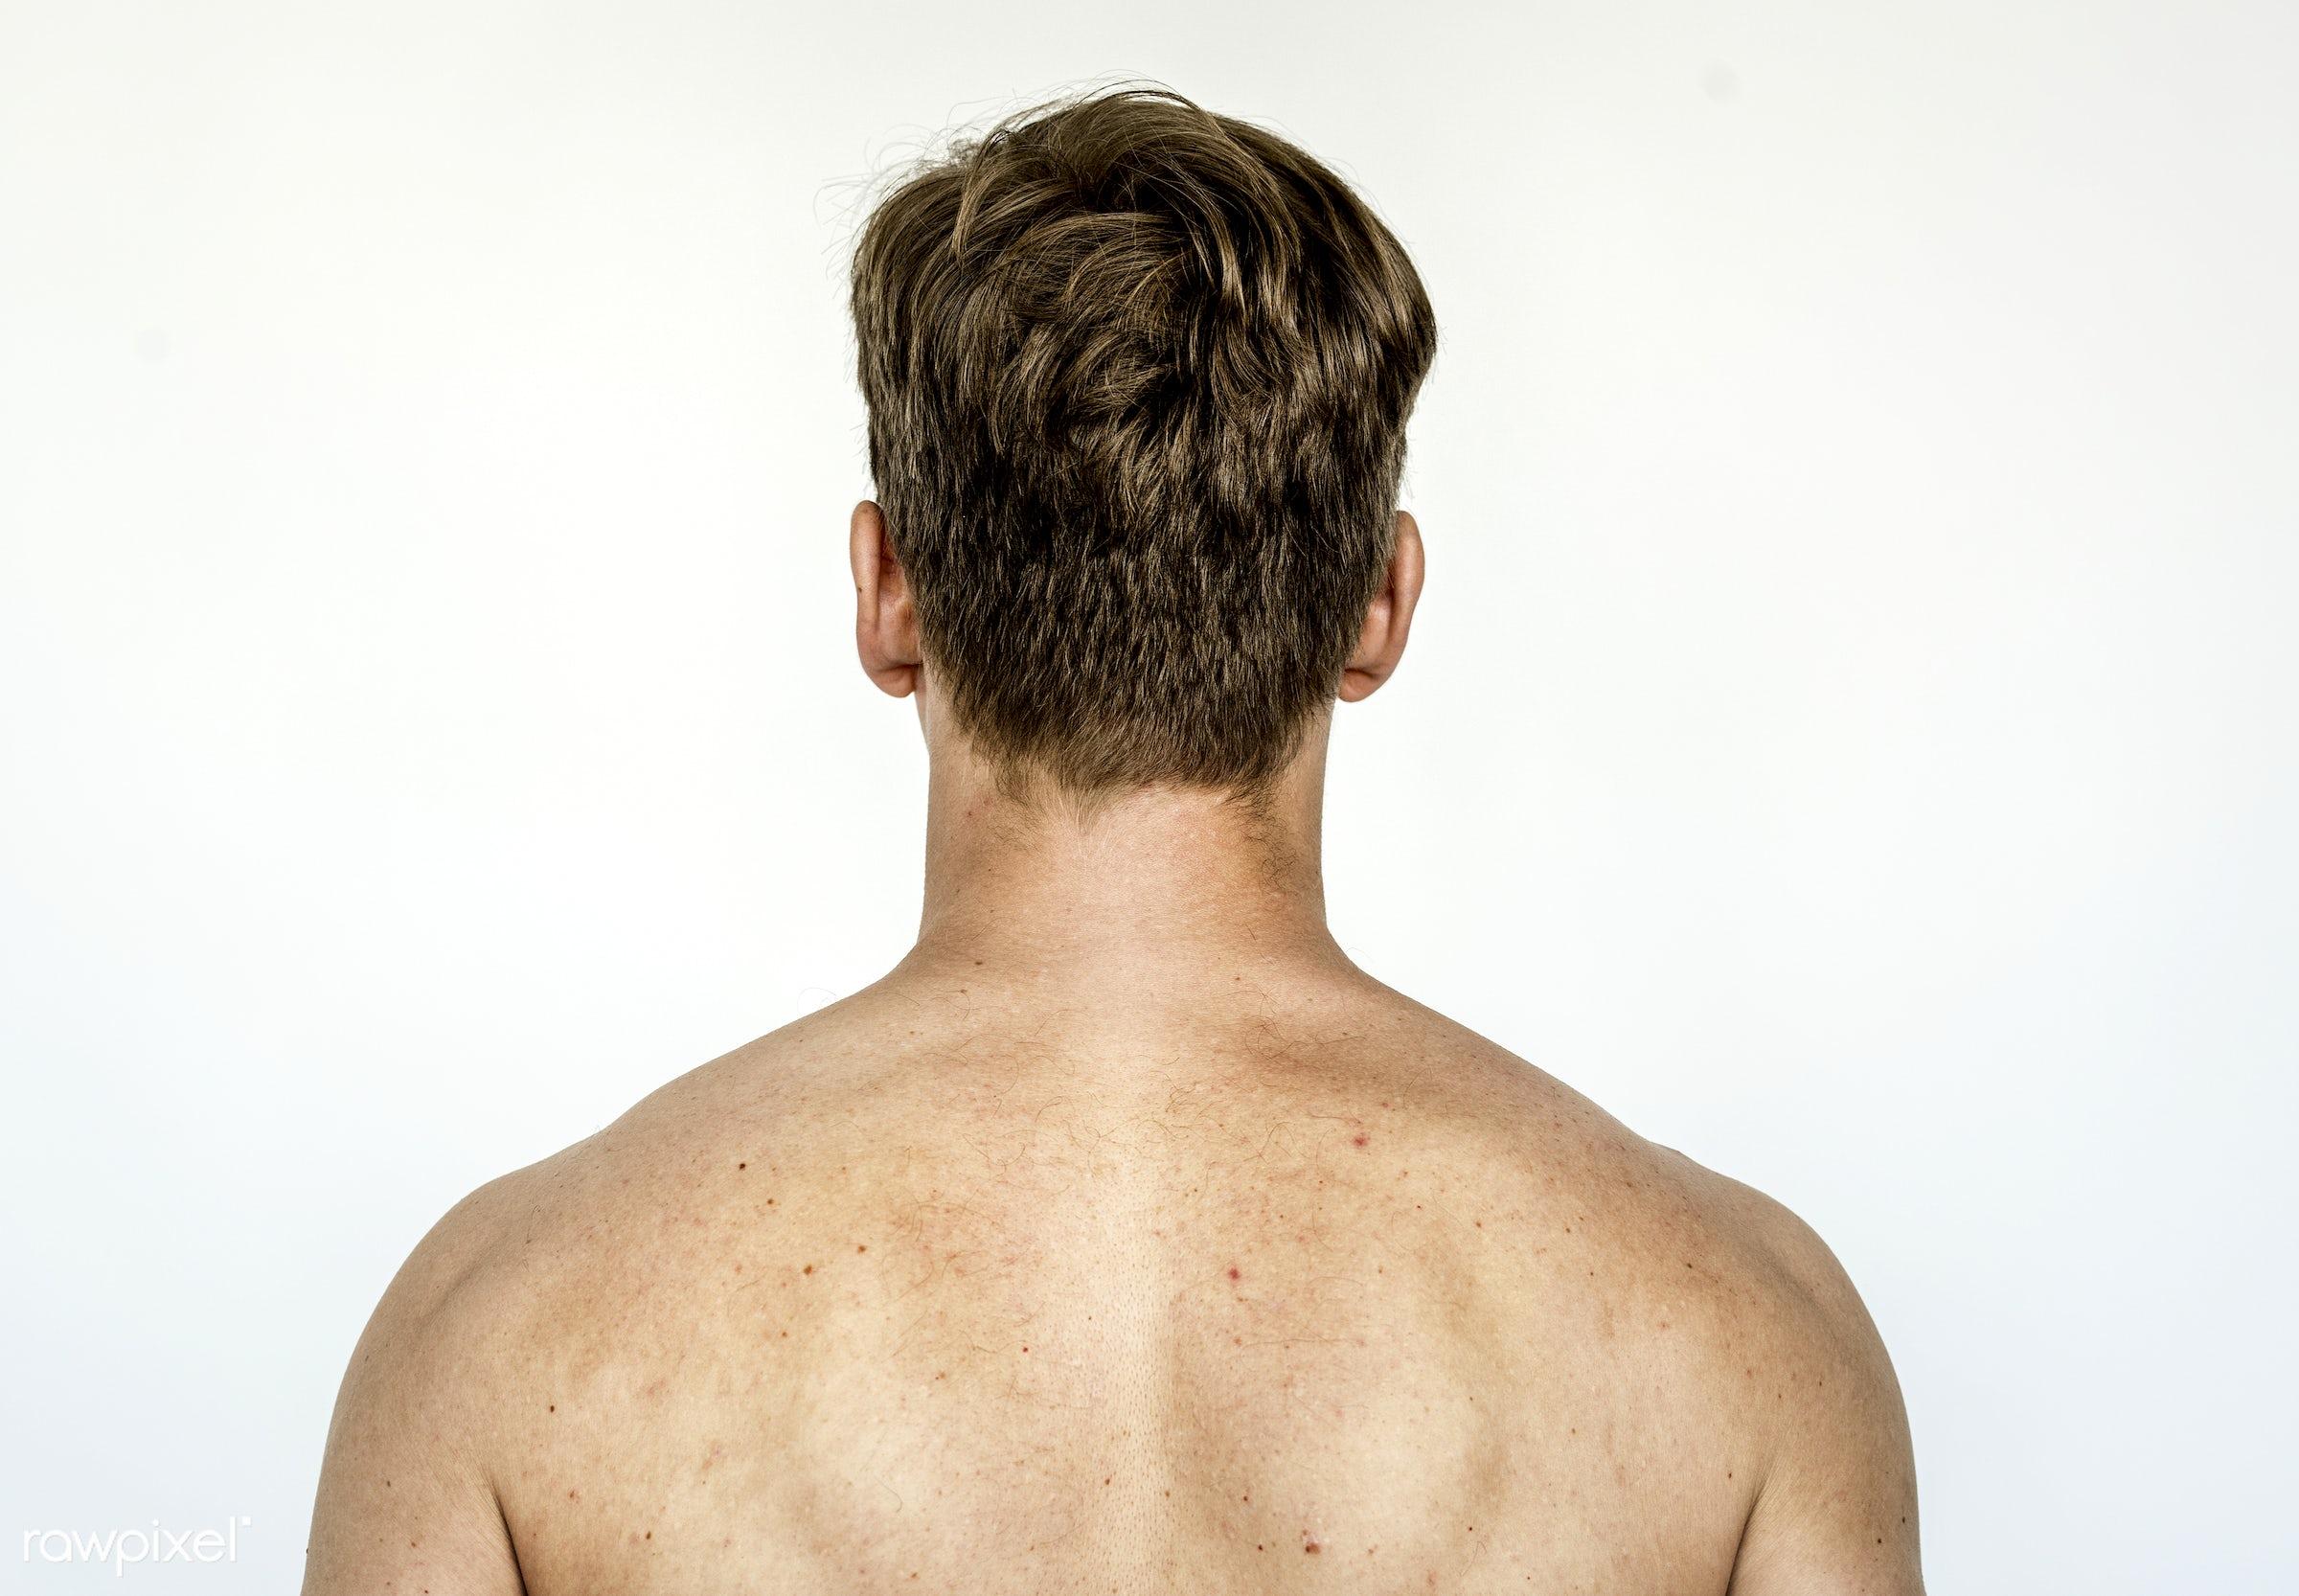 Rear view portrait of a man - face, adult, alone, american, back, caucasian, closeup, european, expression, faces, focus,...